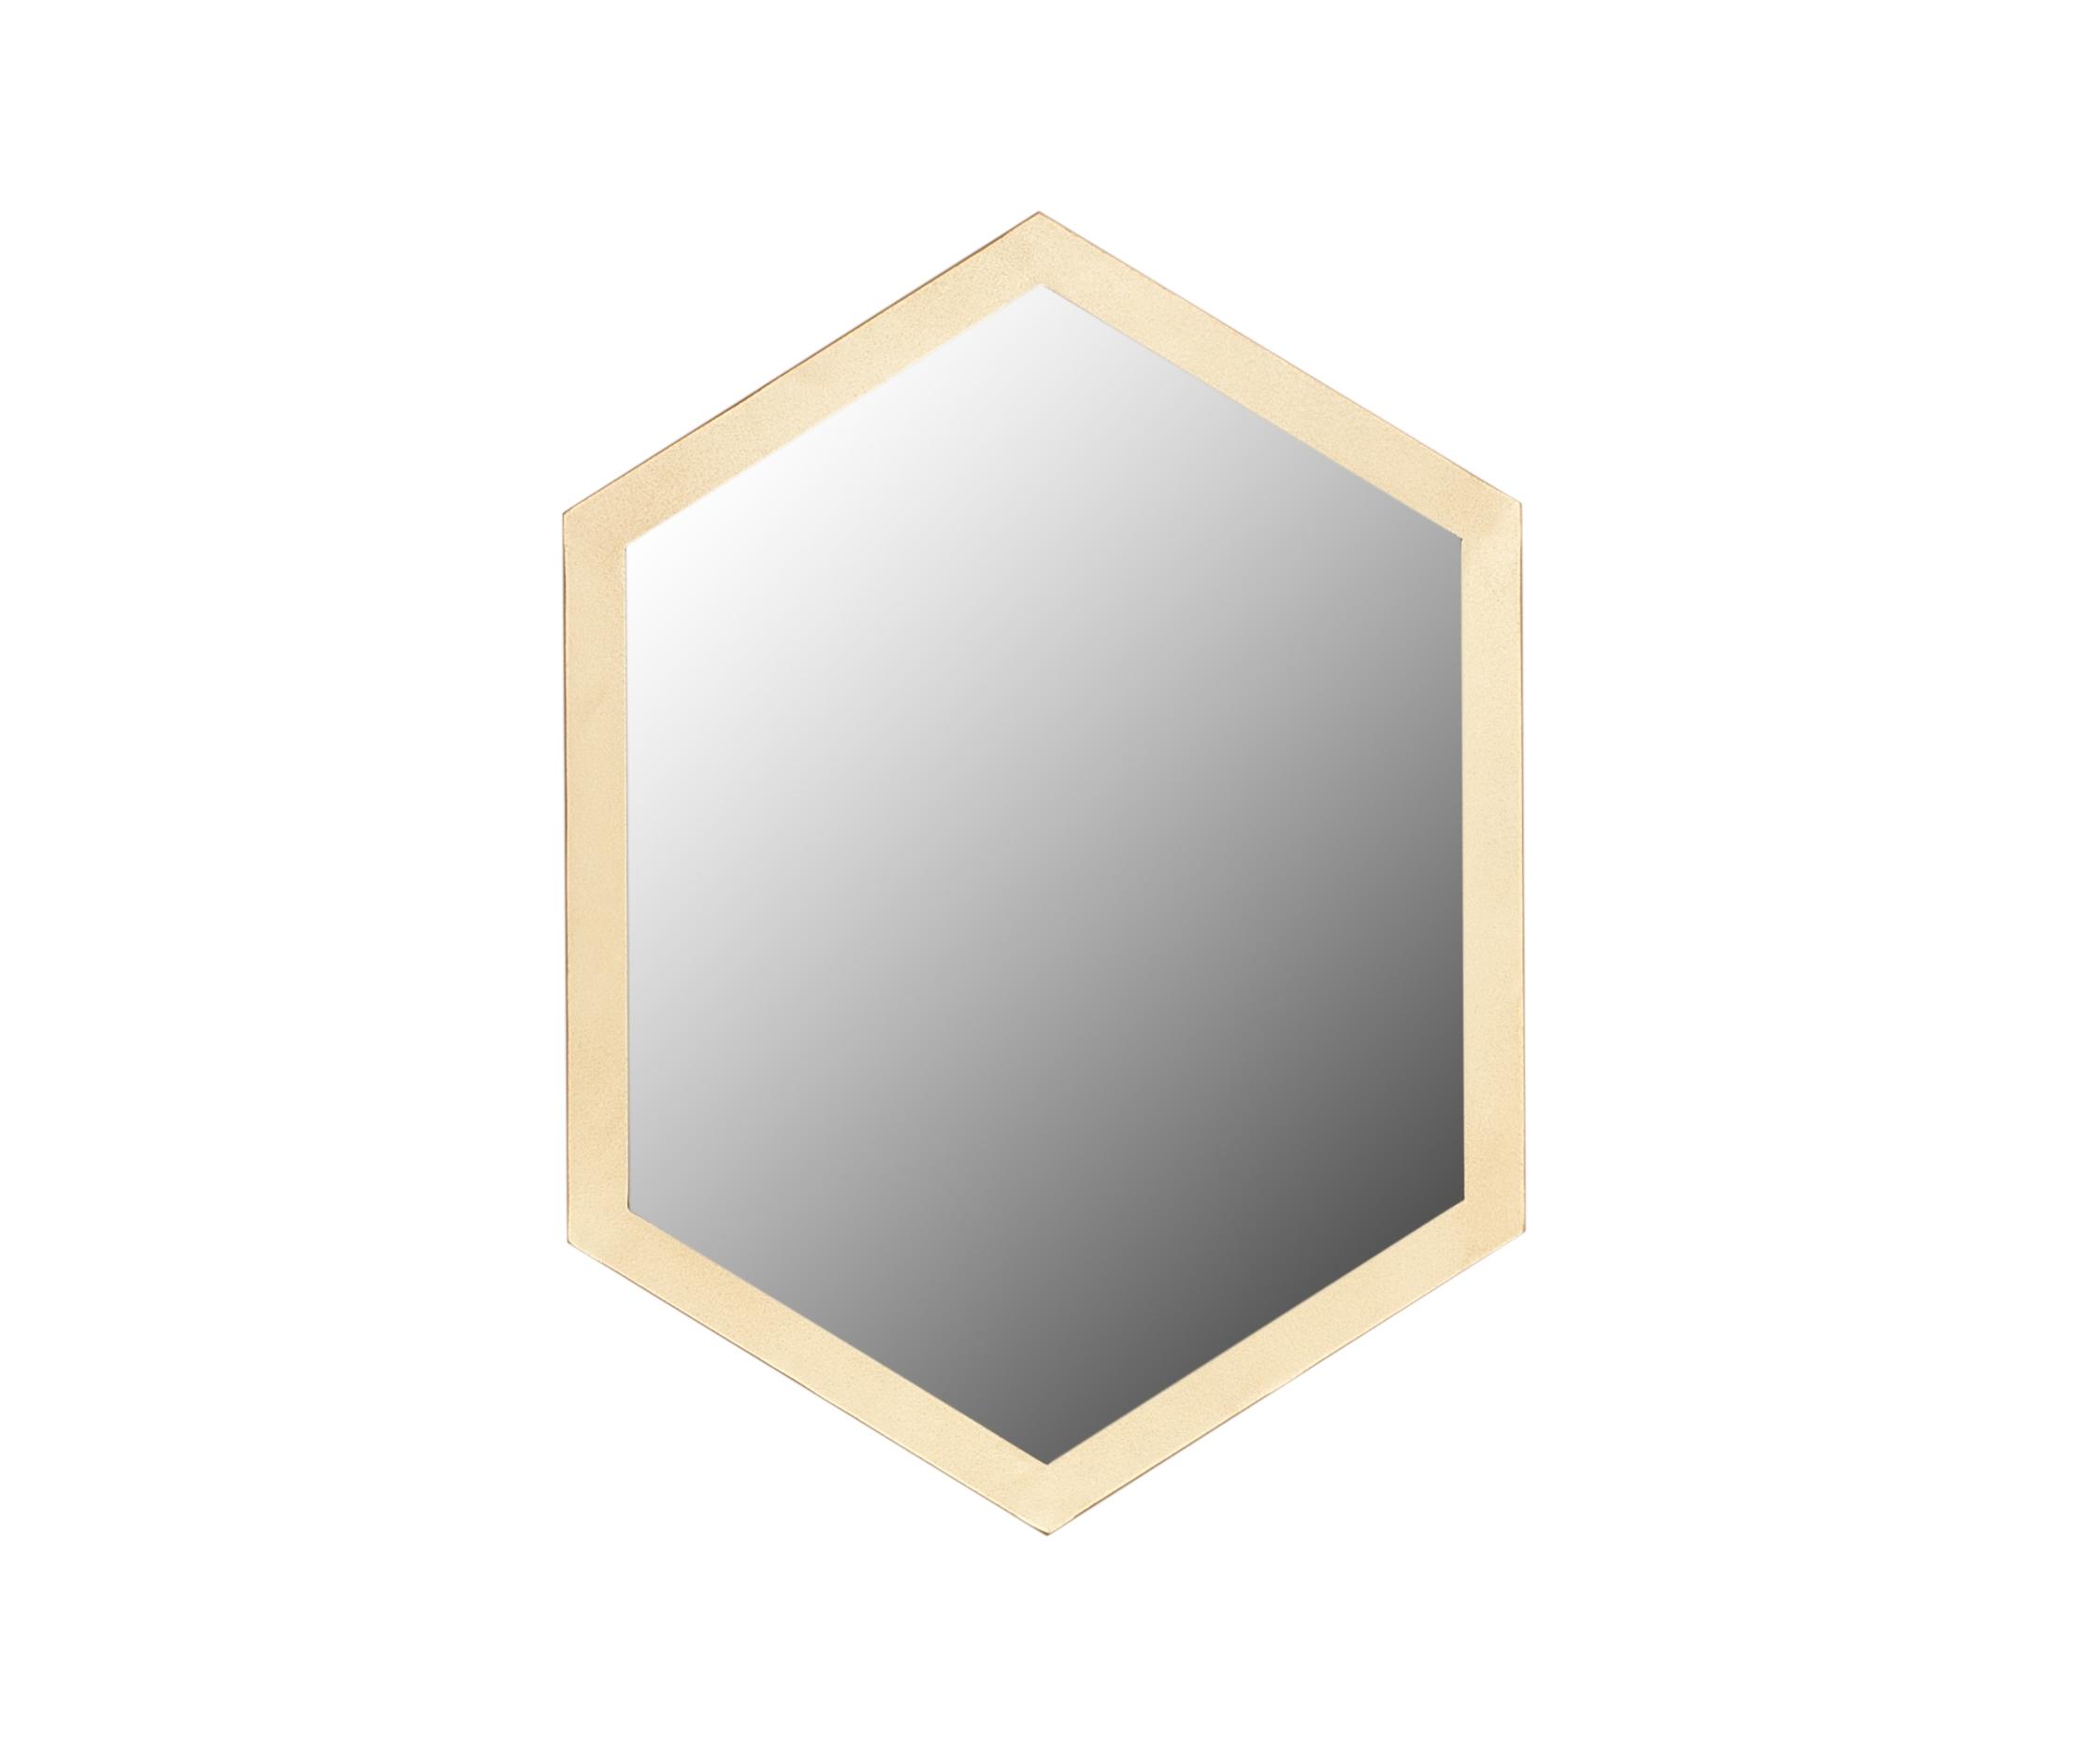 Зеркало (for miss) золотой 55.0x40.0x2.0 см. фото